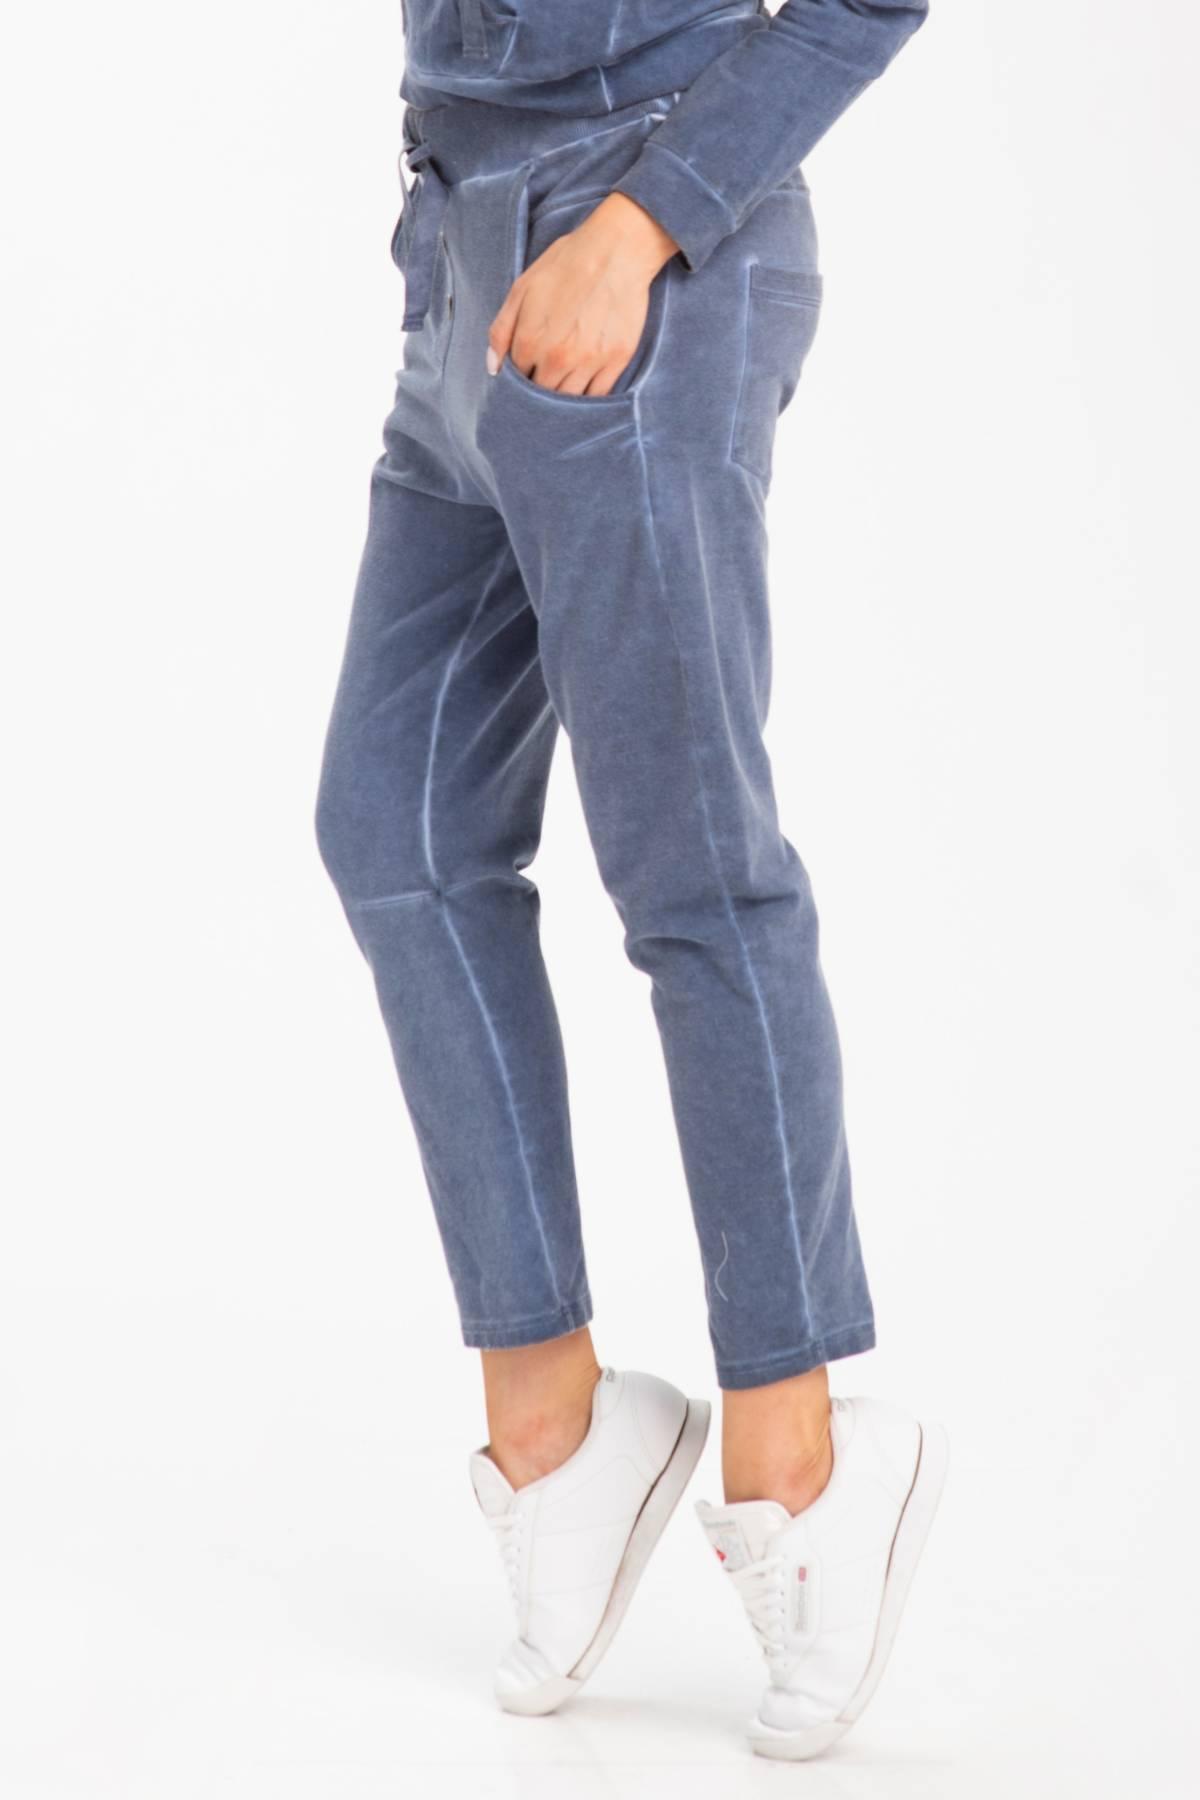 Spodnie jeansowe Denver Look 603F LOOK made with Love - Slow Store   JestemSlow.pl